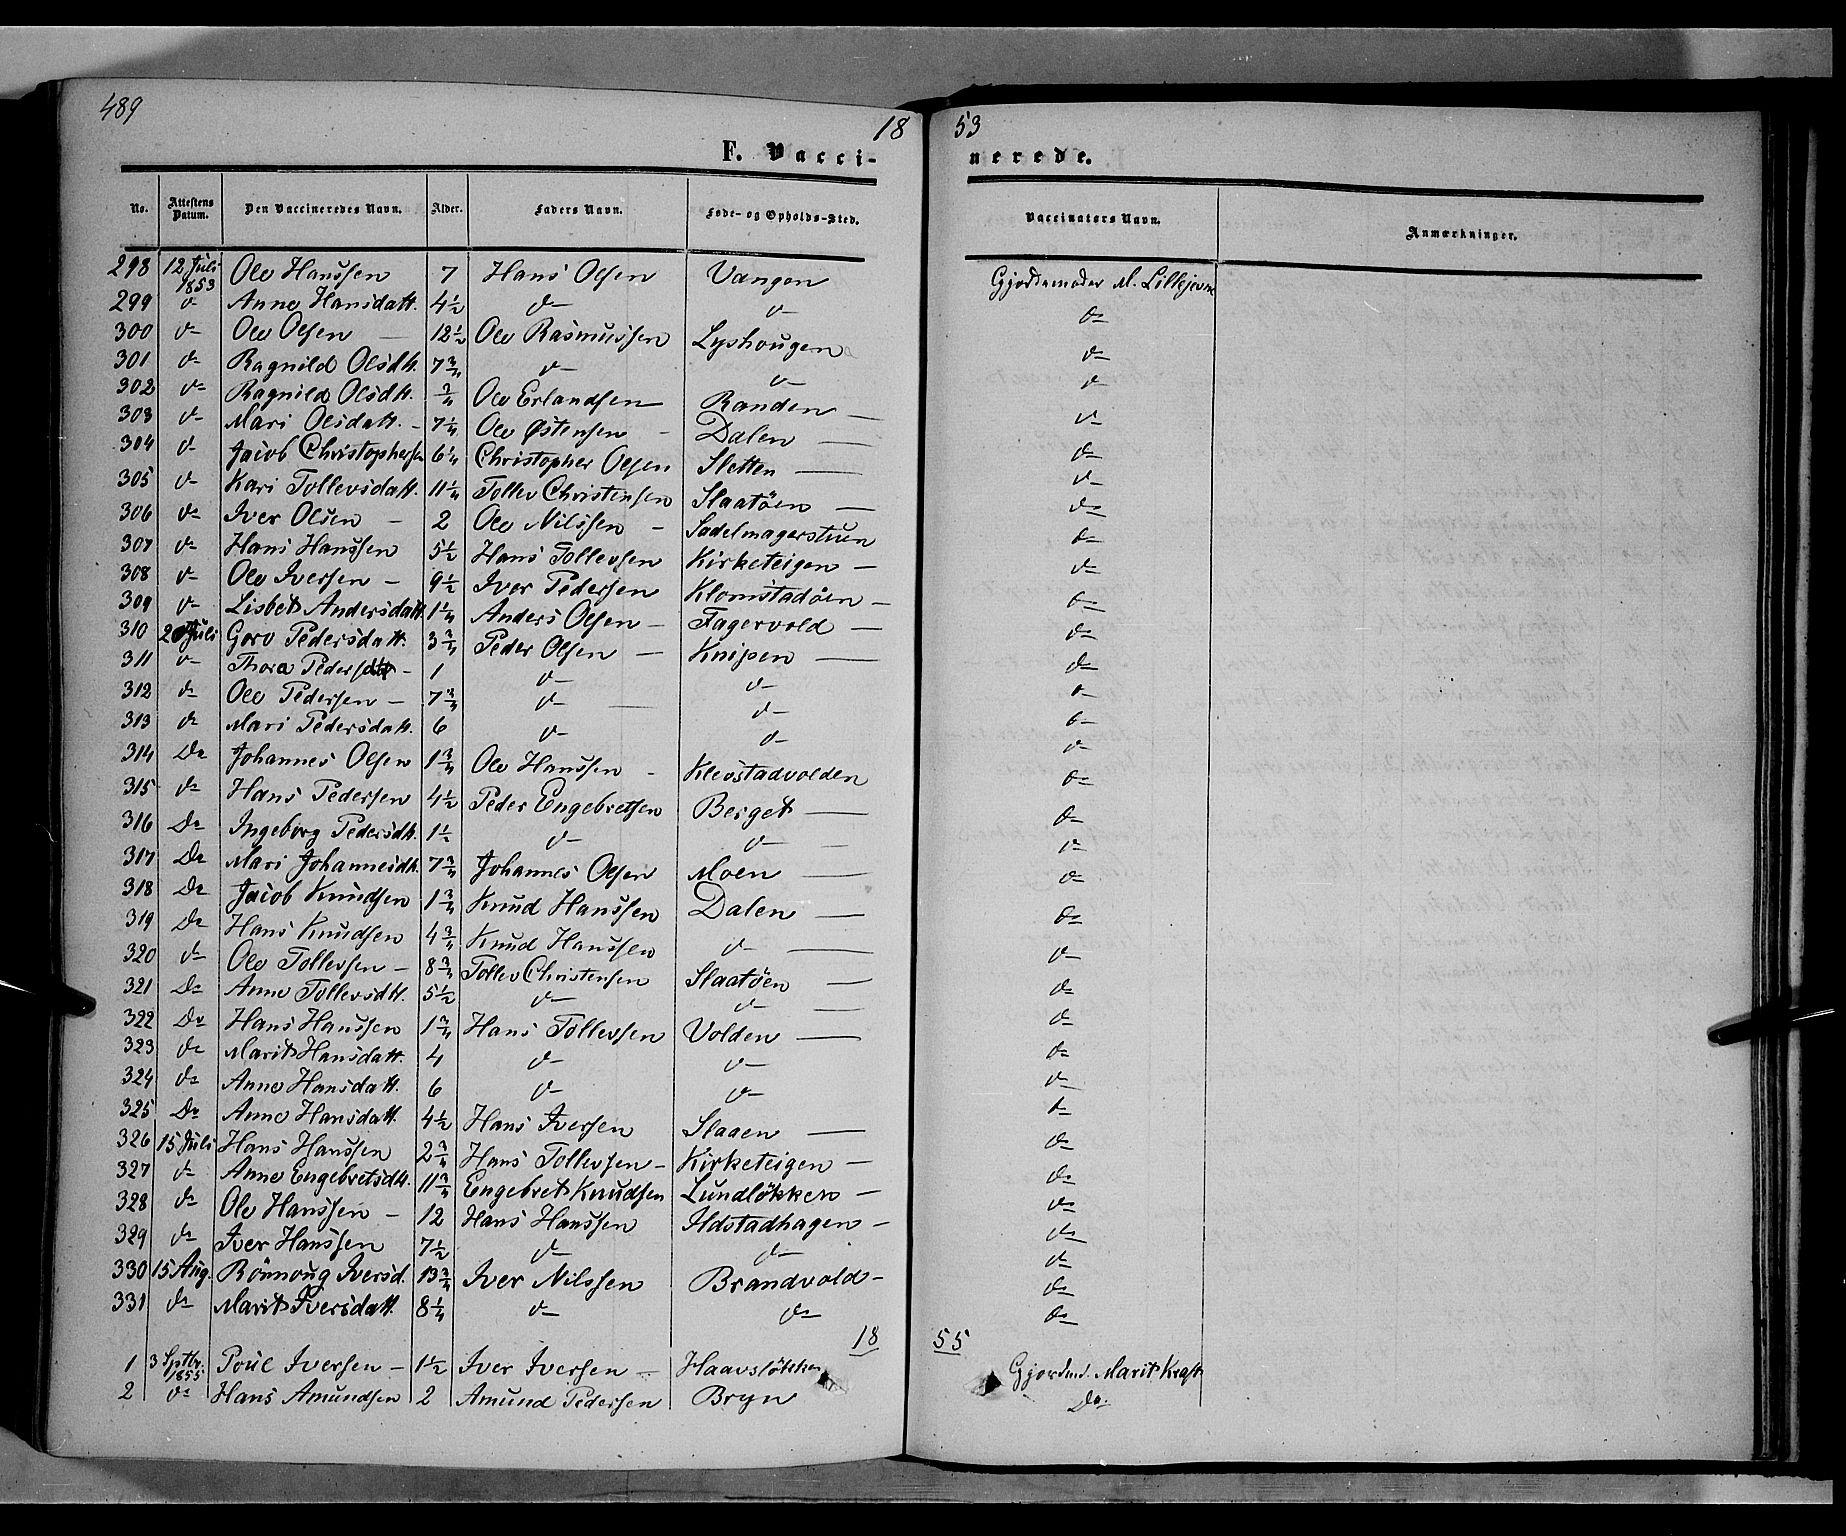 SAH, Nord-Fron prestekontor, Ministerialbok nr. 1, 1851-1864, s. 489